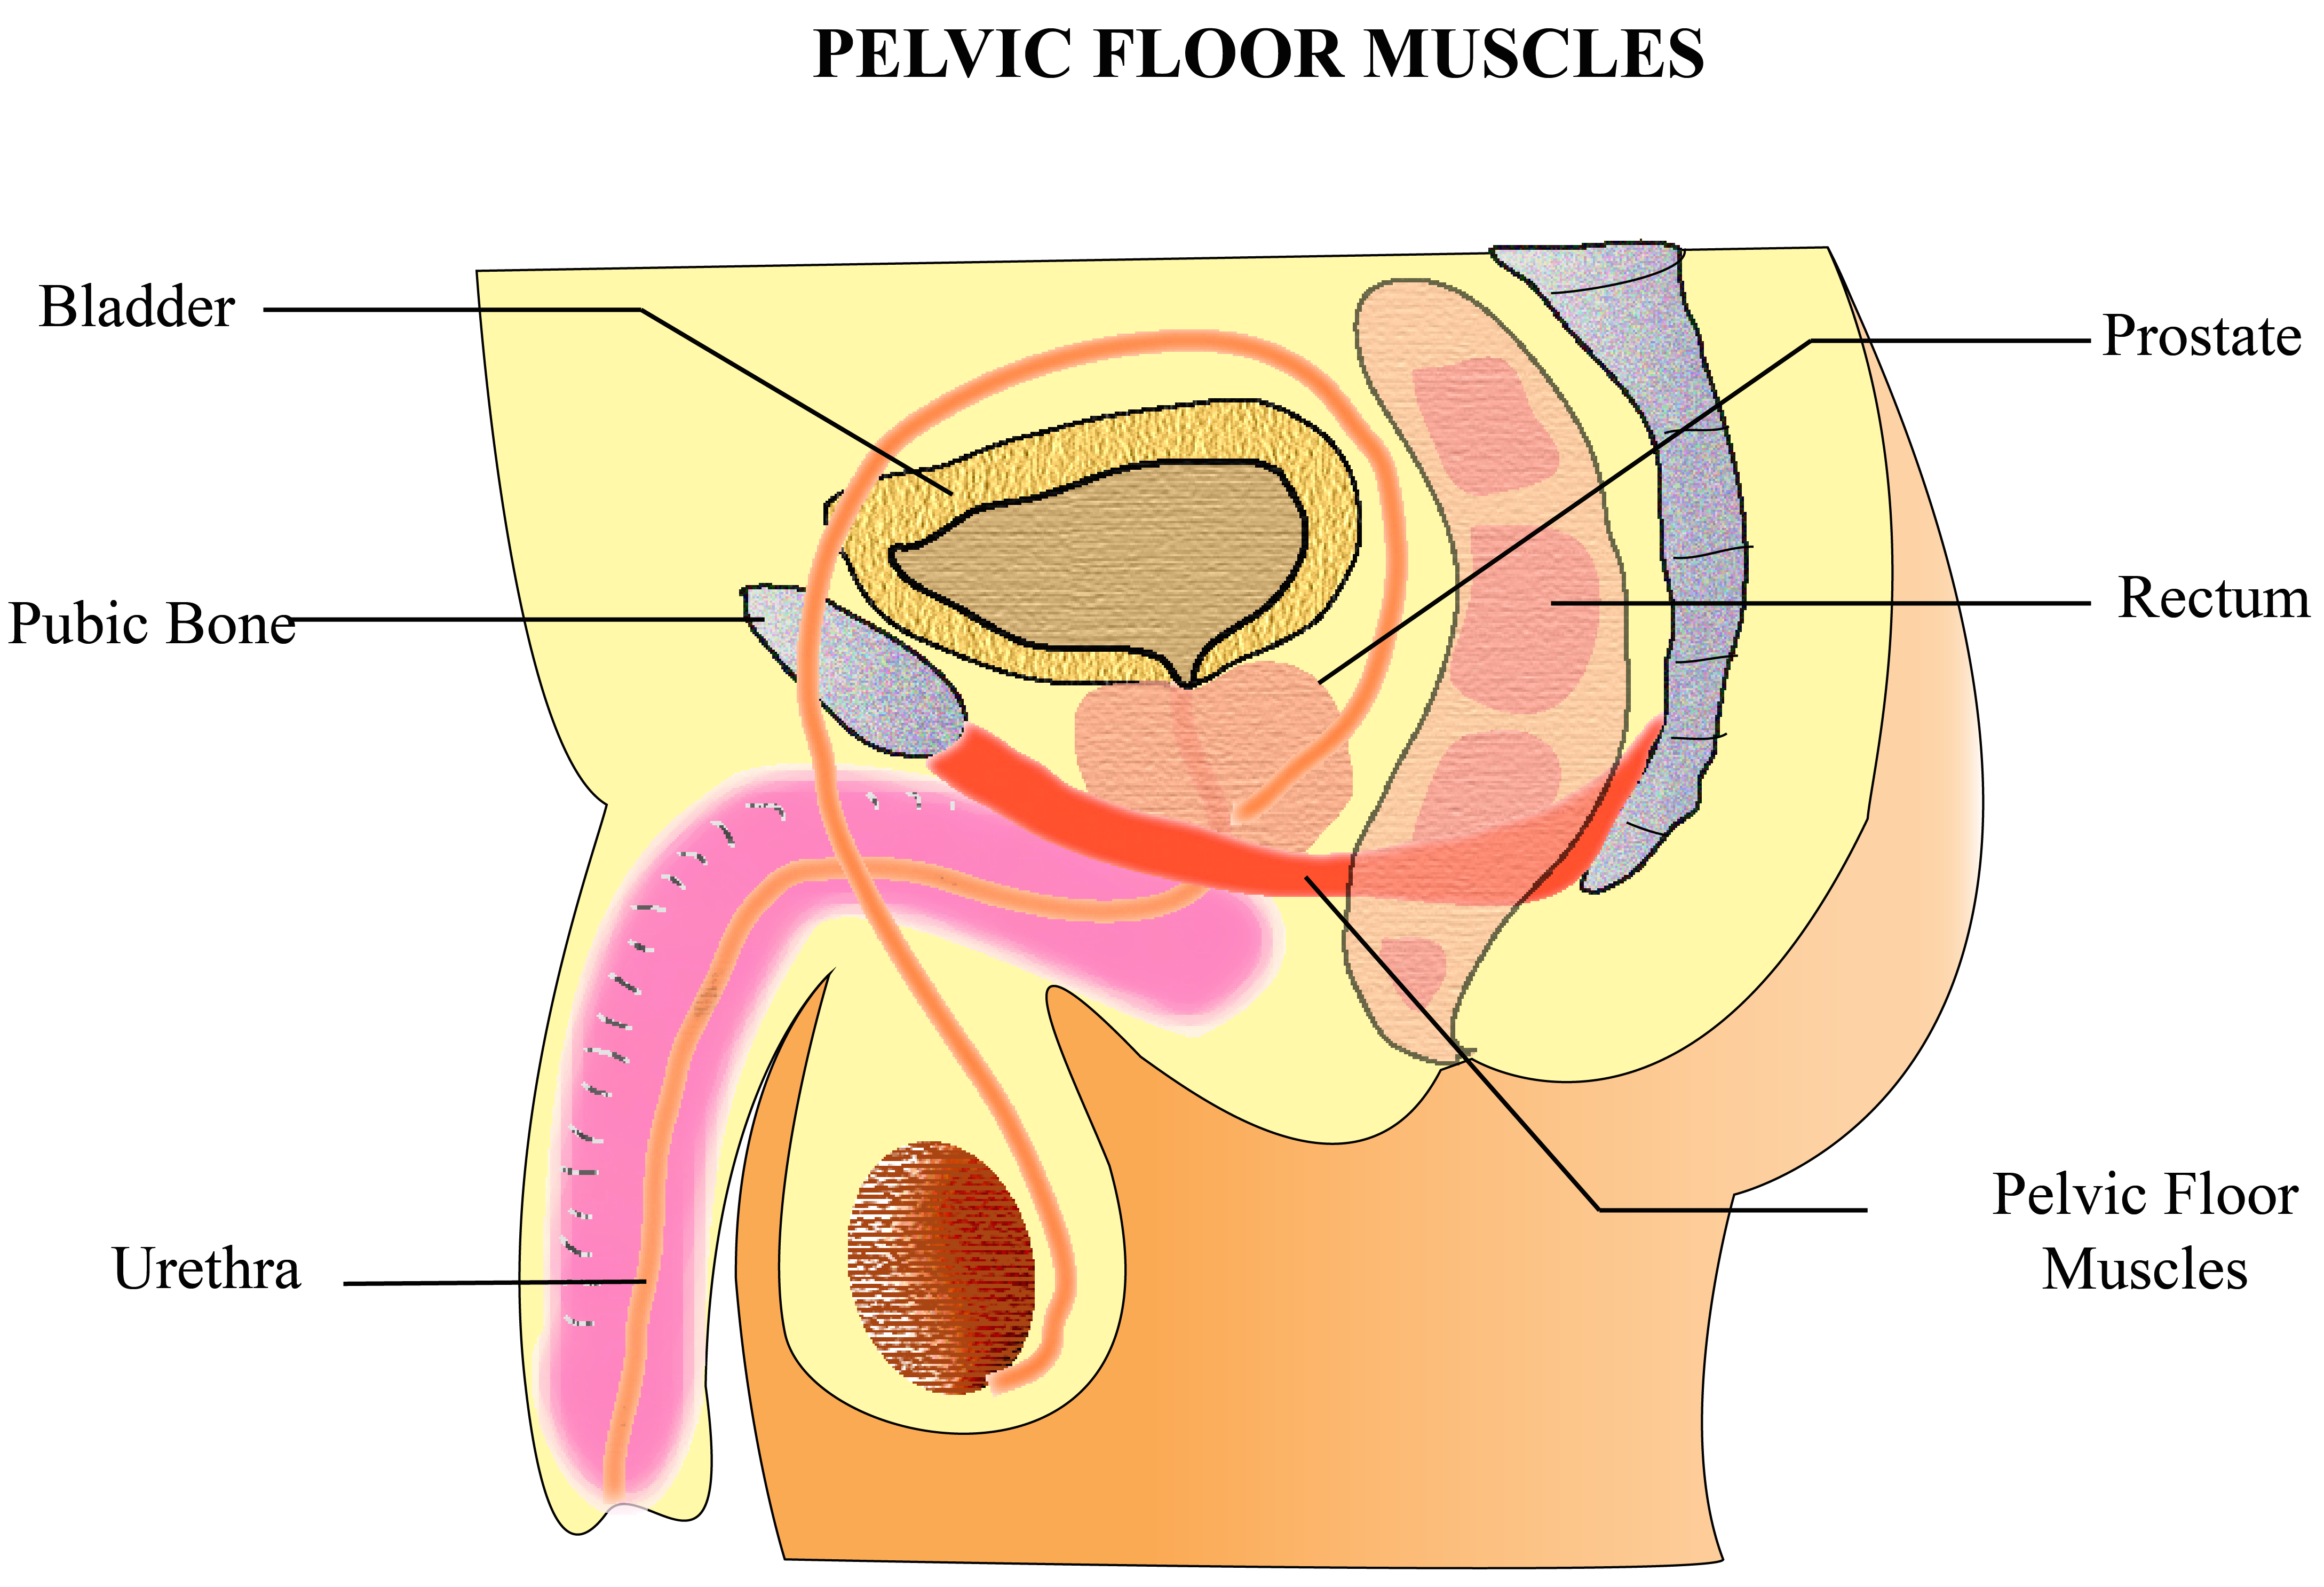 Pelvic Floor Exercises Controlling The Flow Pelvic Floor